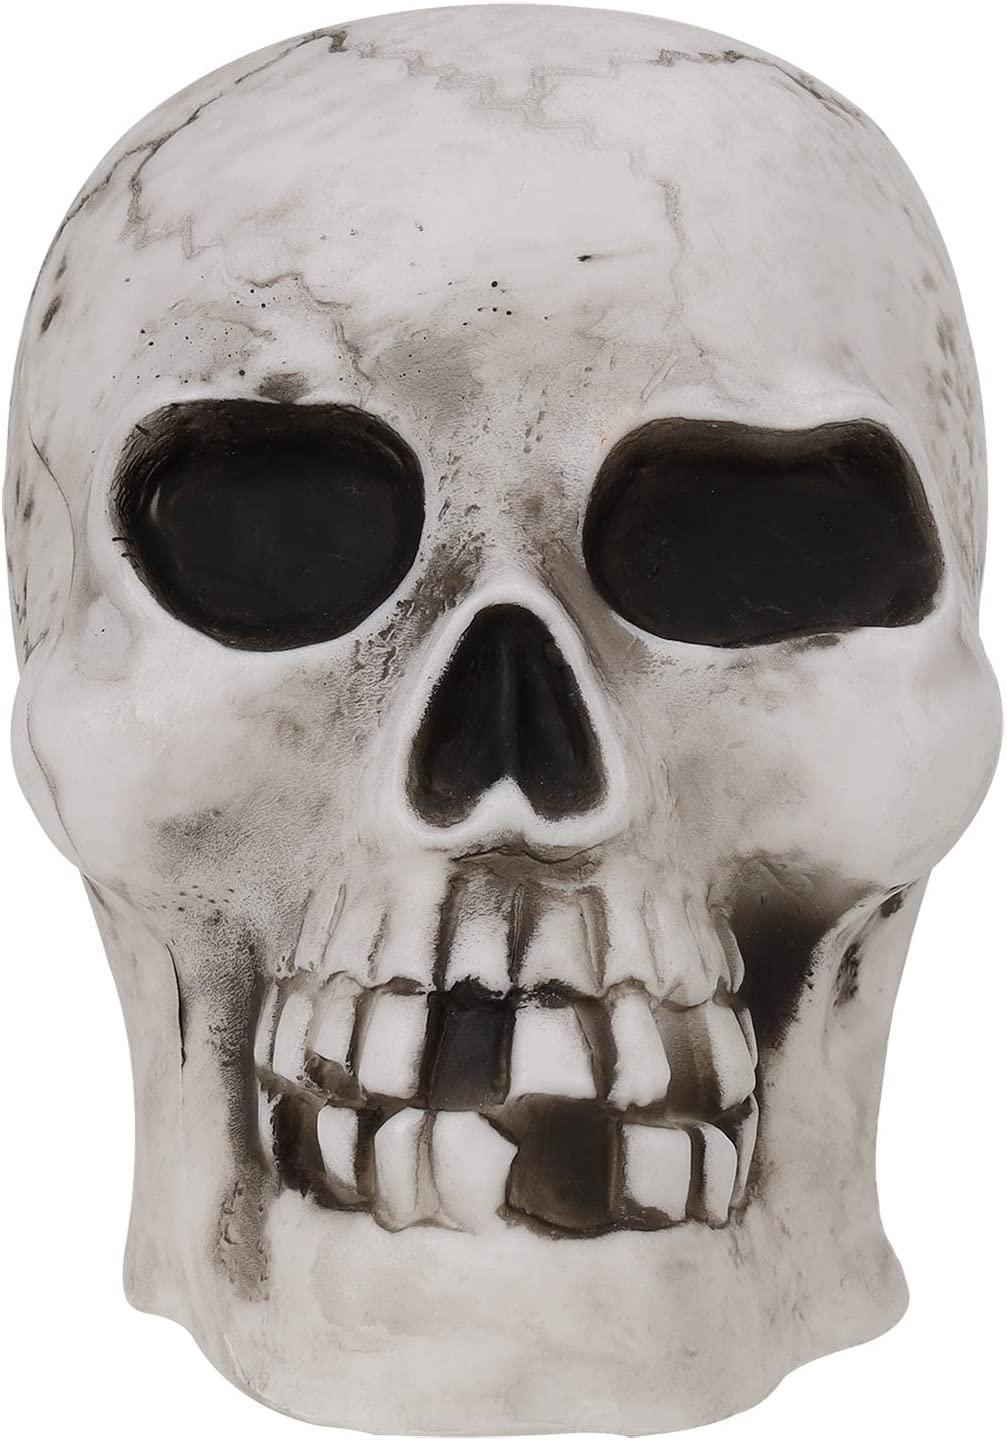 Halloween Skull, Halloween Skeletons,Halloween Decoration Party Supplies